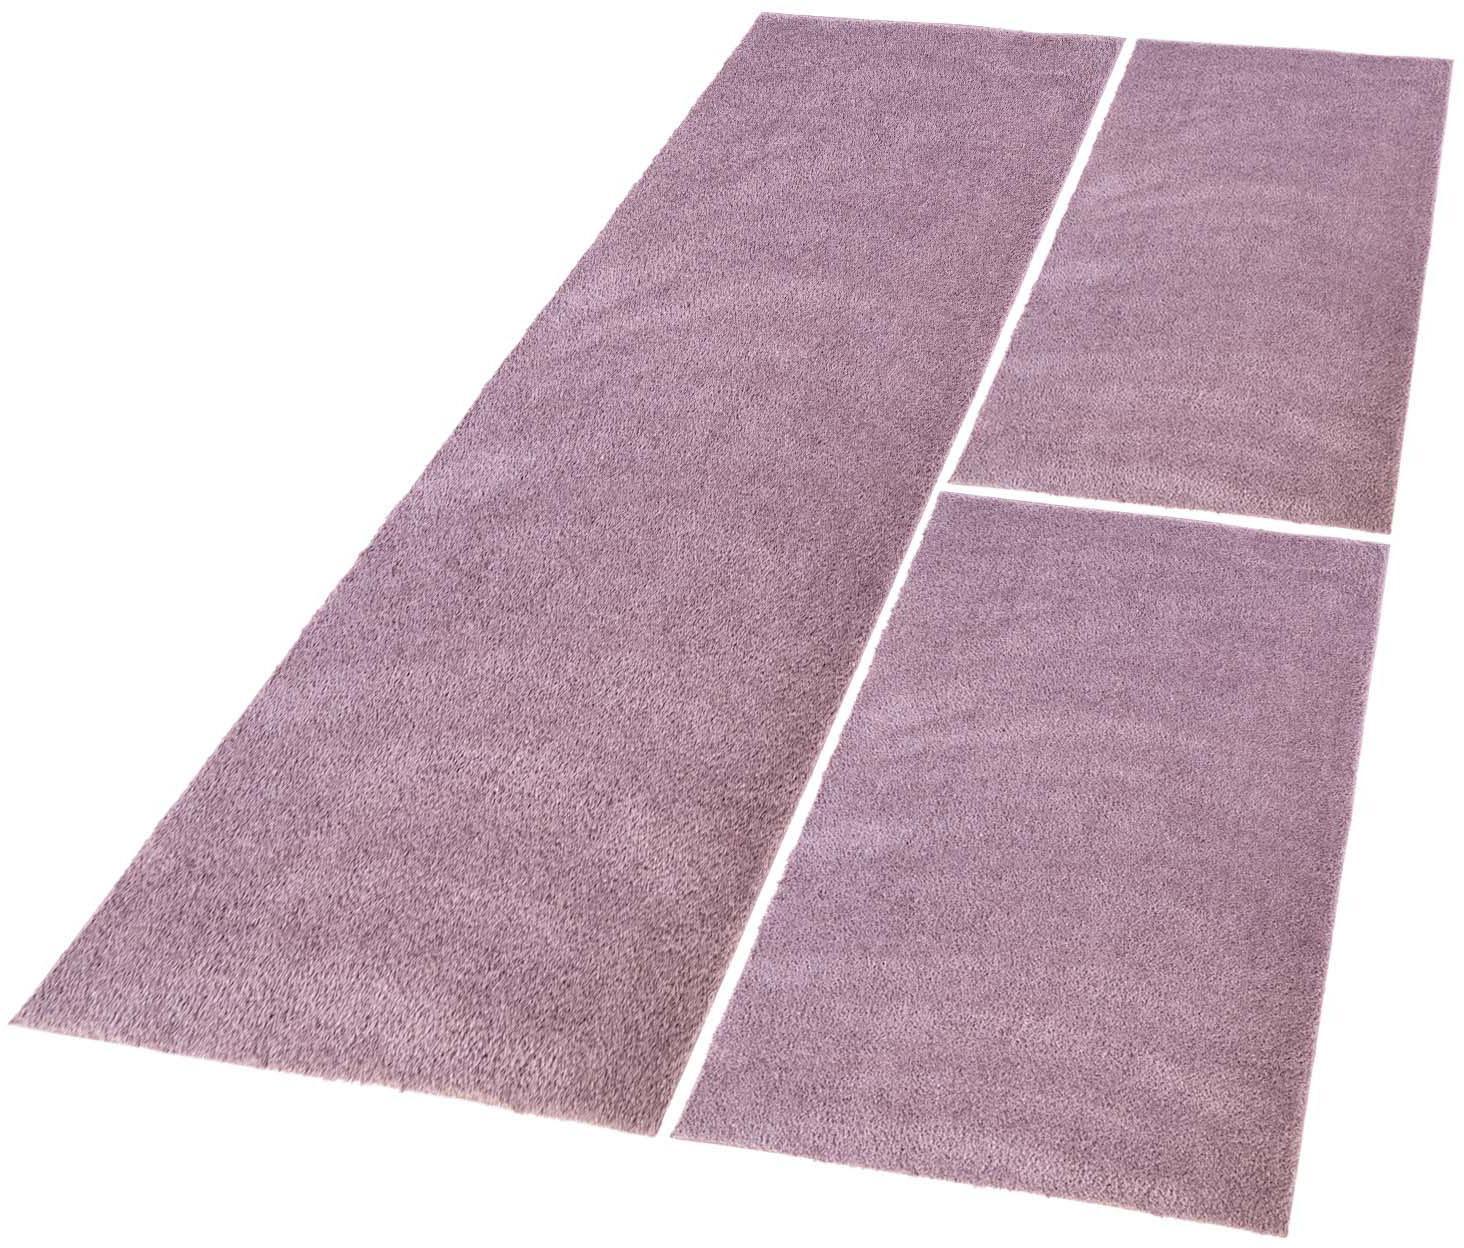 Bettumrandung »Softshine 2236« Carpet City, Höhe 30 mm (Set, 3-tlg.) | Heimtextilien > Teppiche > Läufer | Lila | Polyester - Microfaser | Carpet City